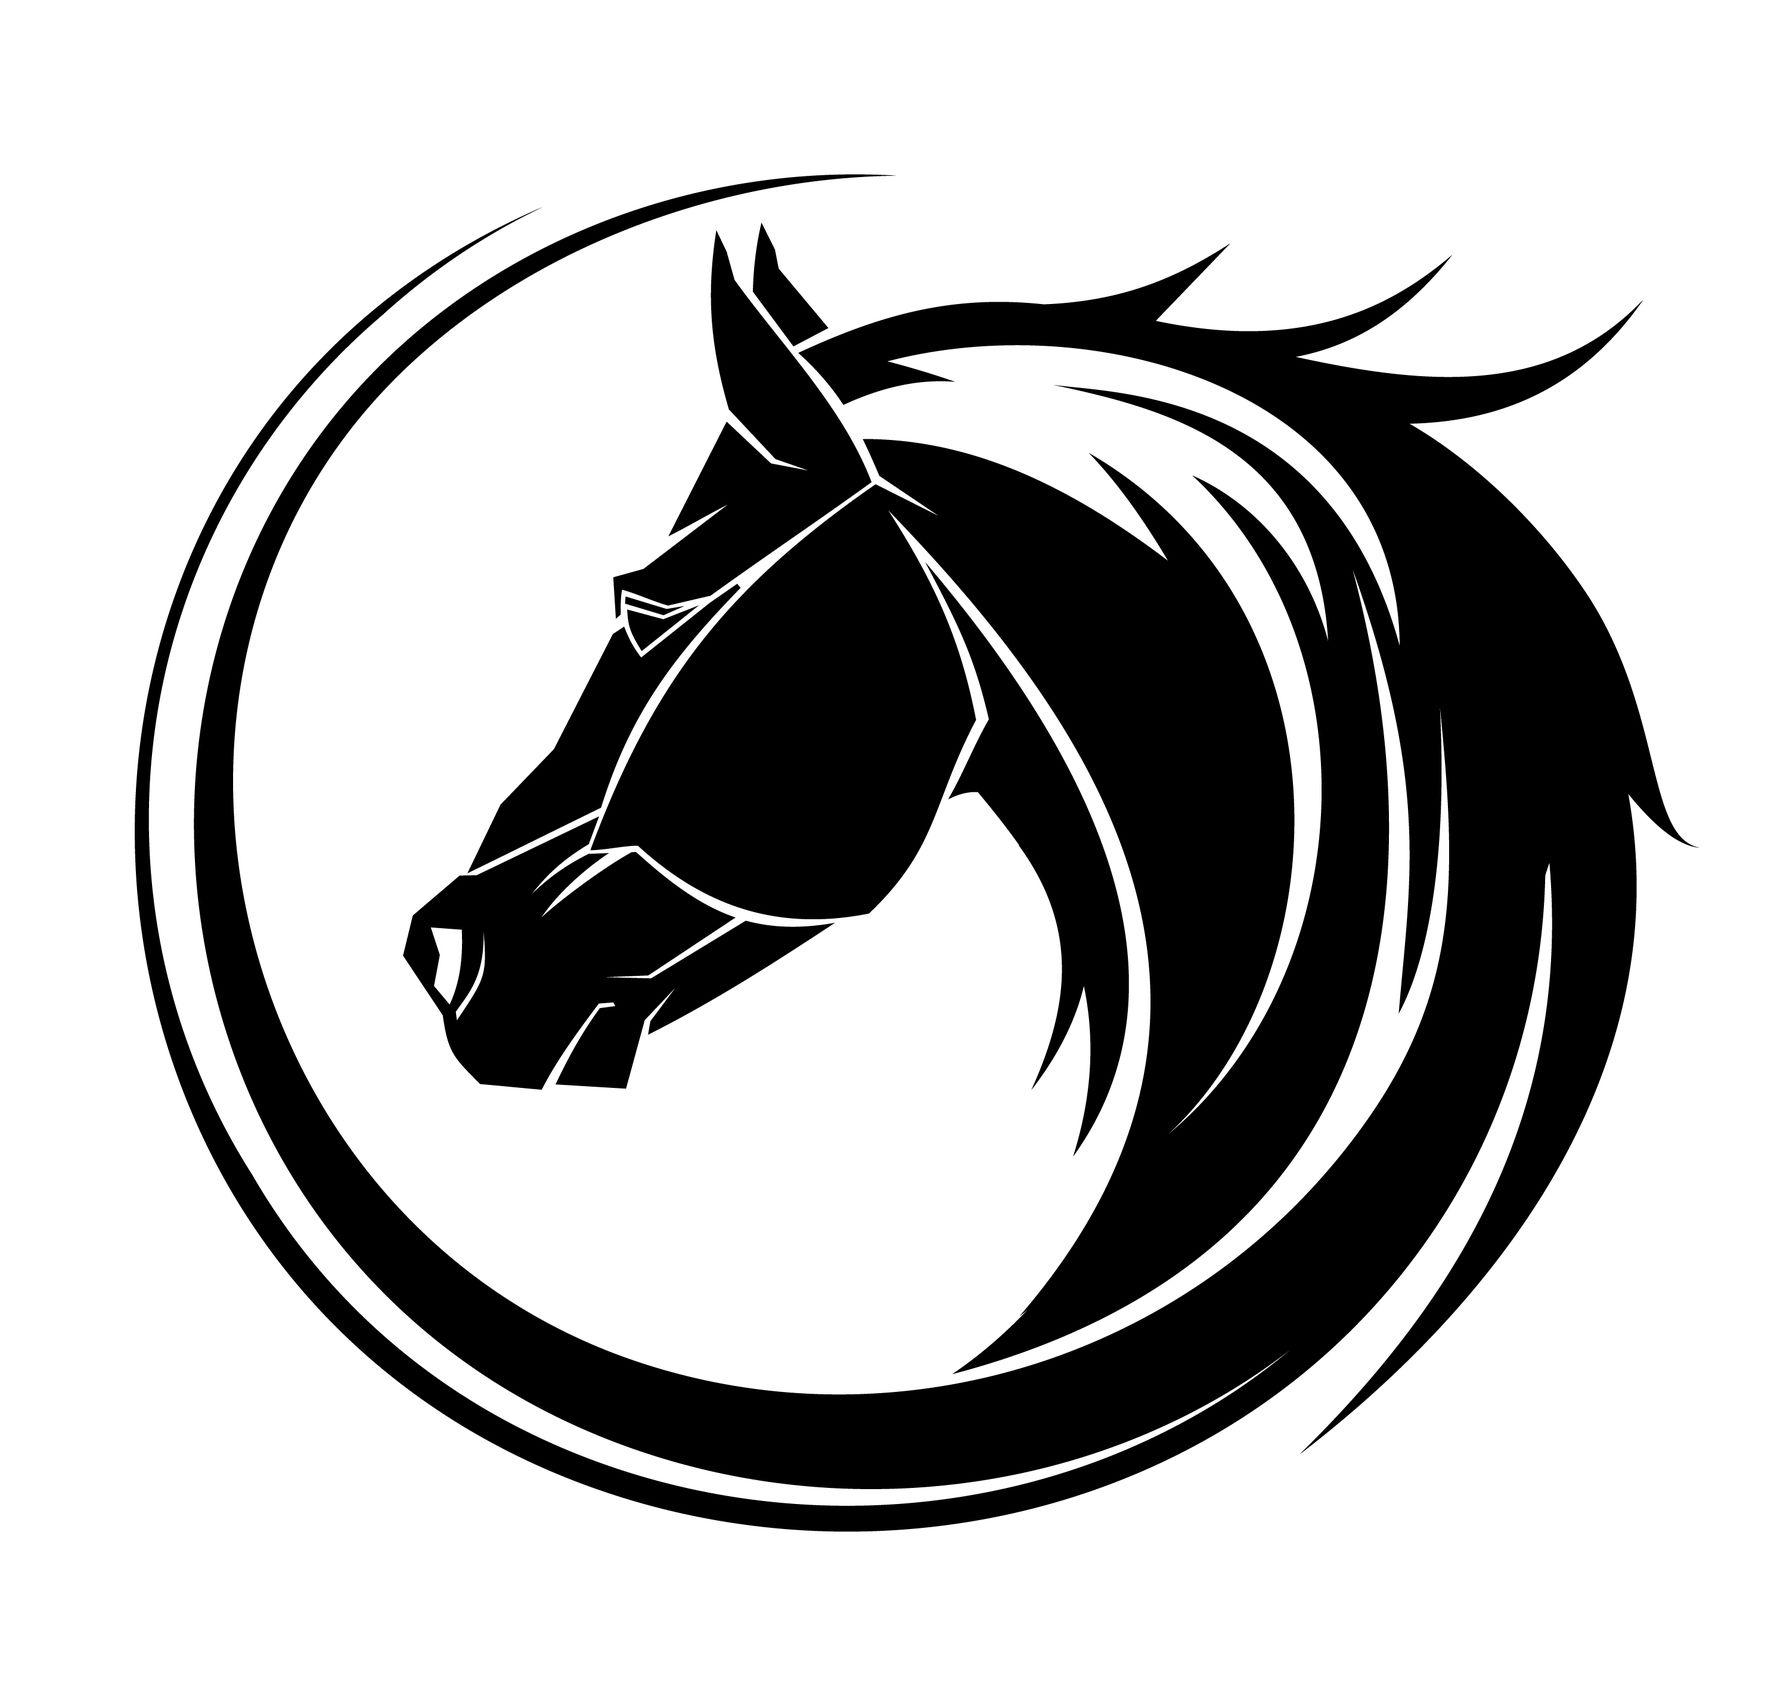 Tribal Horse Tattoos for Women | cute horse head tattoo | Tattoo ...